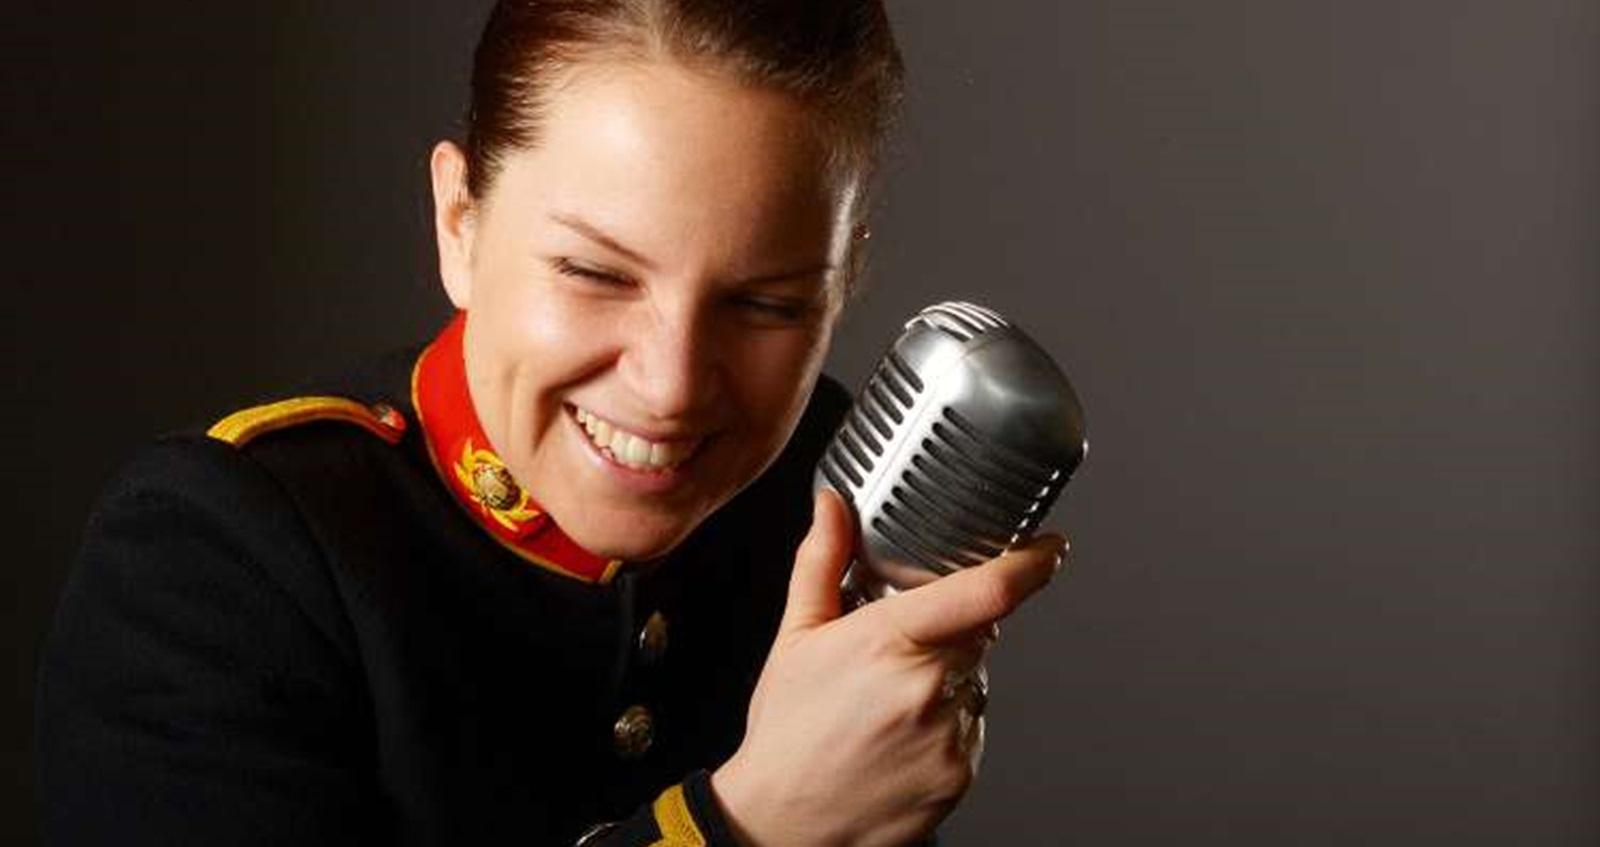 Poppy Pawsey in her band uniform singing